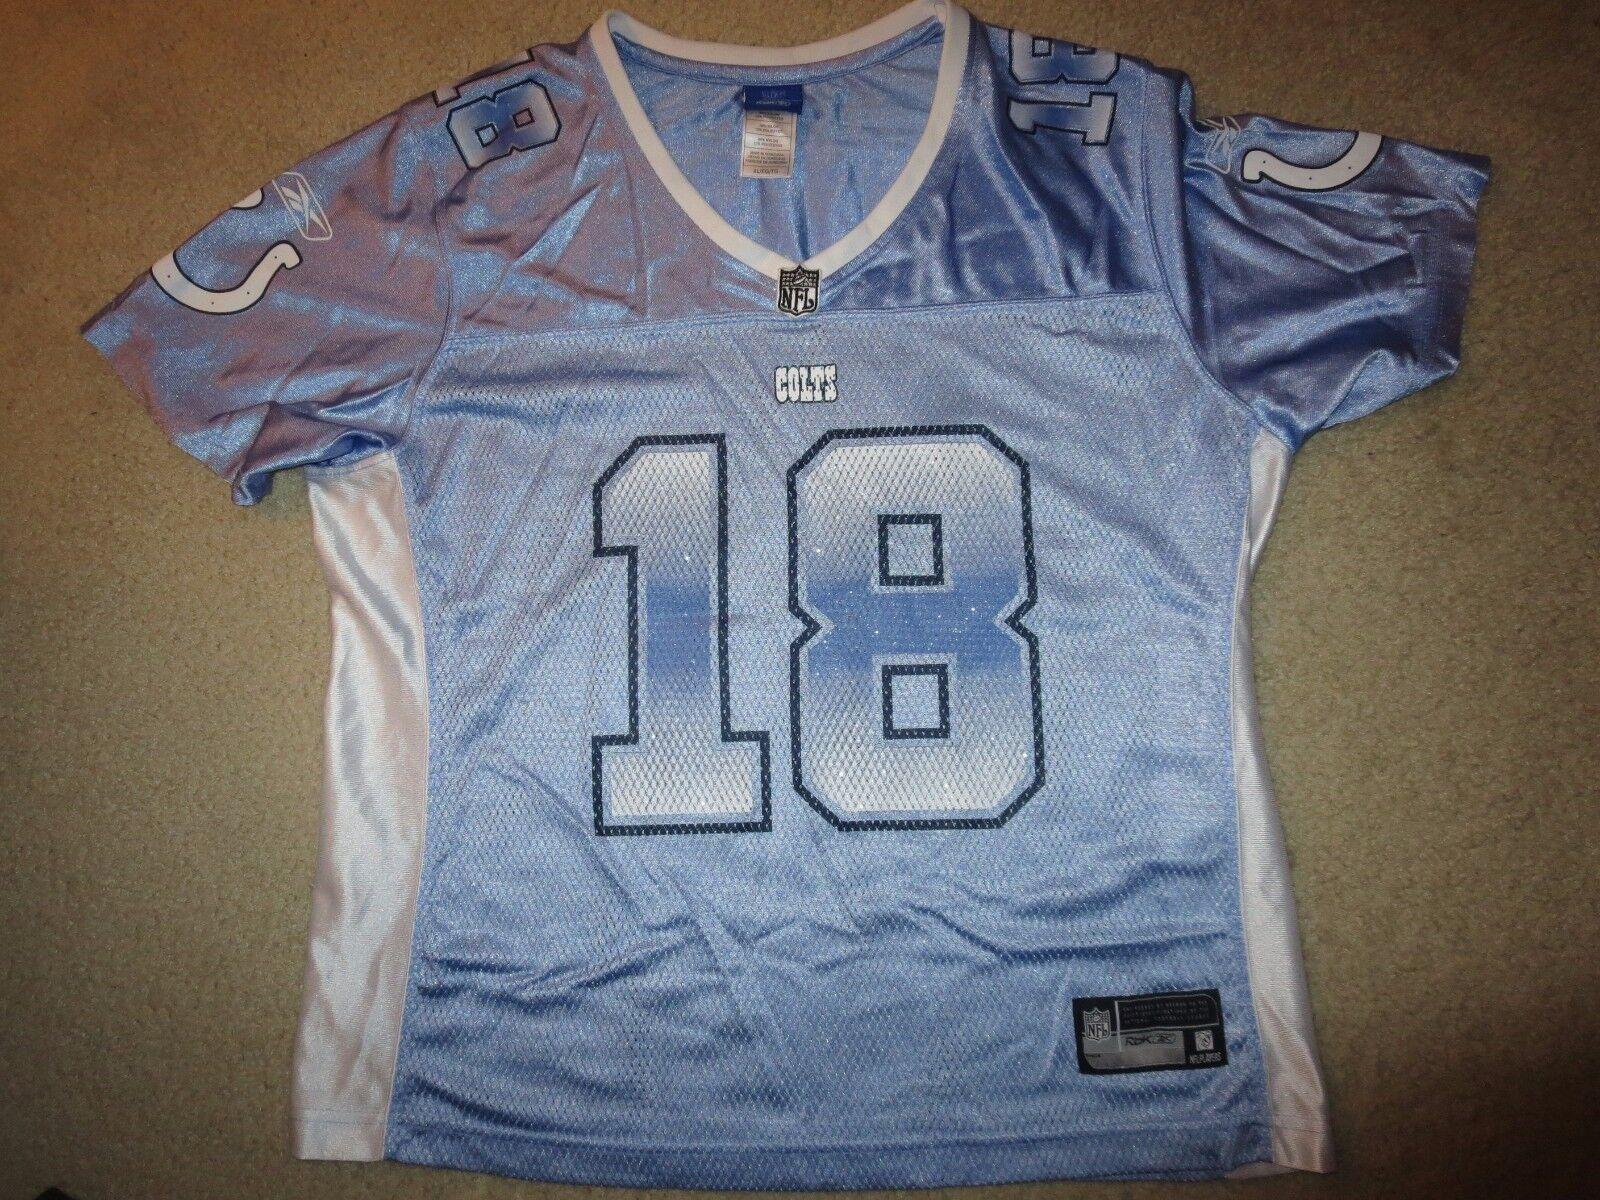 Peyton Manning  16 Indianapolis Colts Colts Colts Reebok NFL Trikot Damen  | Sale Outlet  f7785c